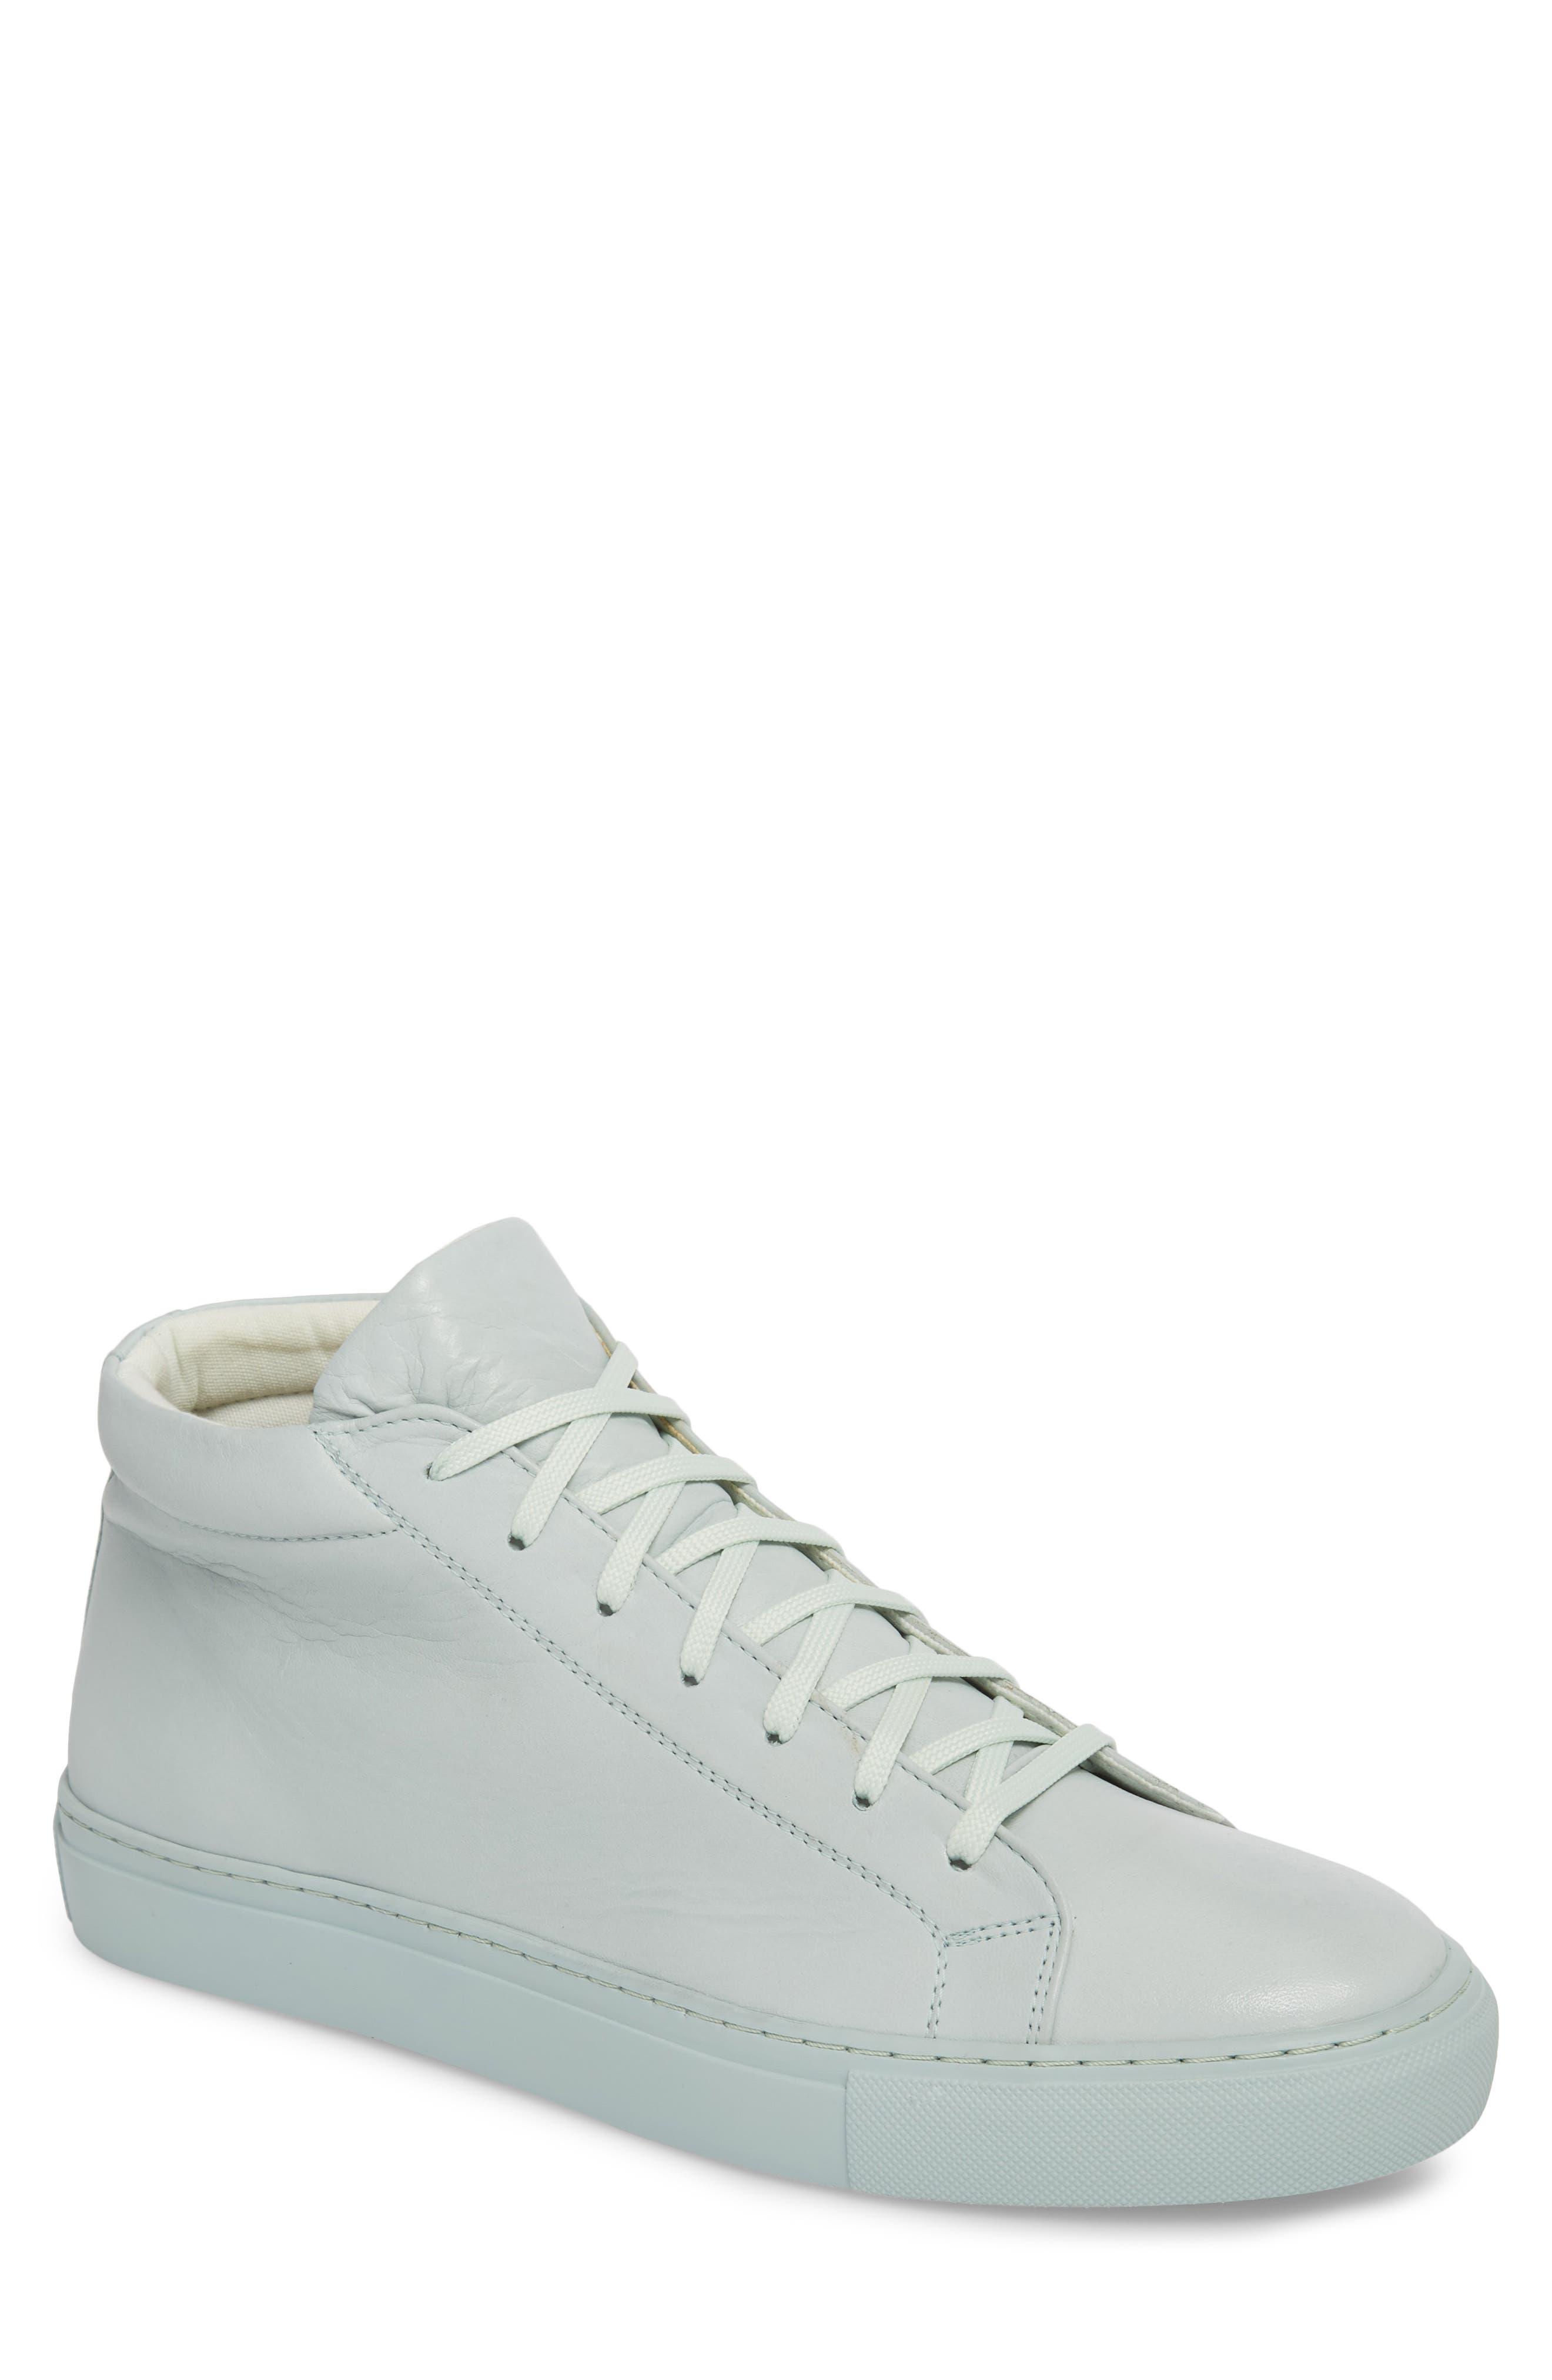 Lexington Mid Top Sneaker,                         Main,                         color,